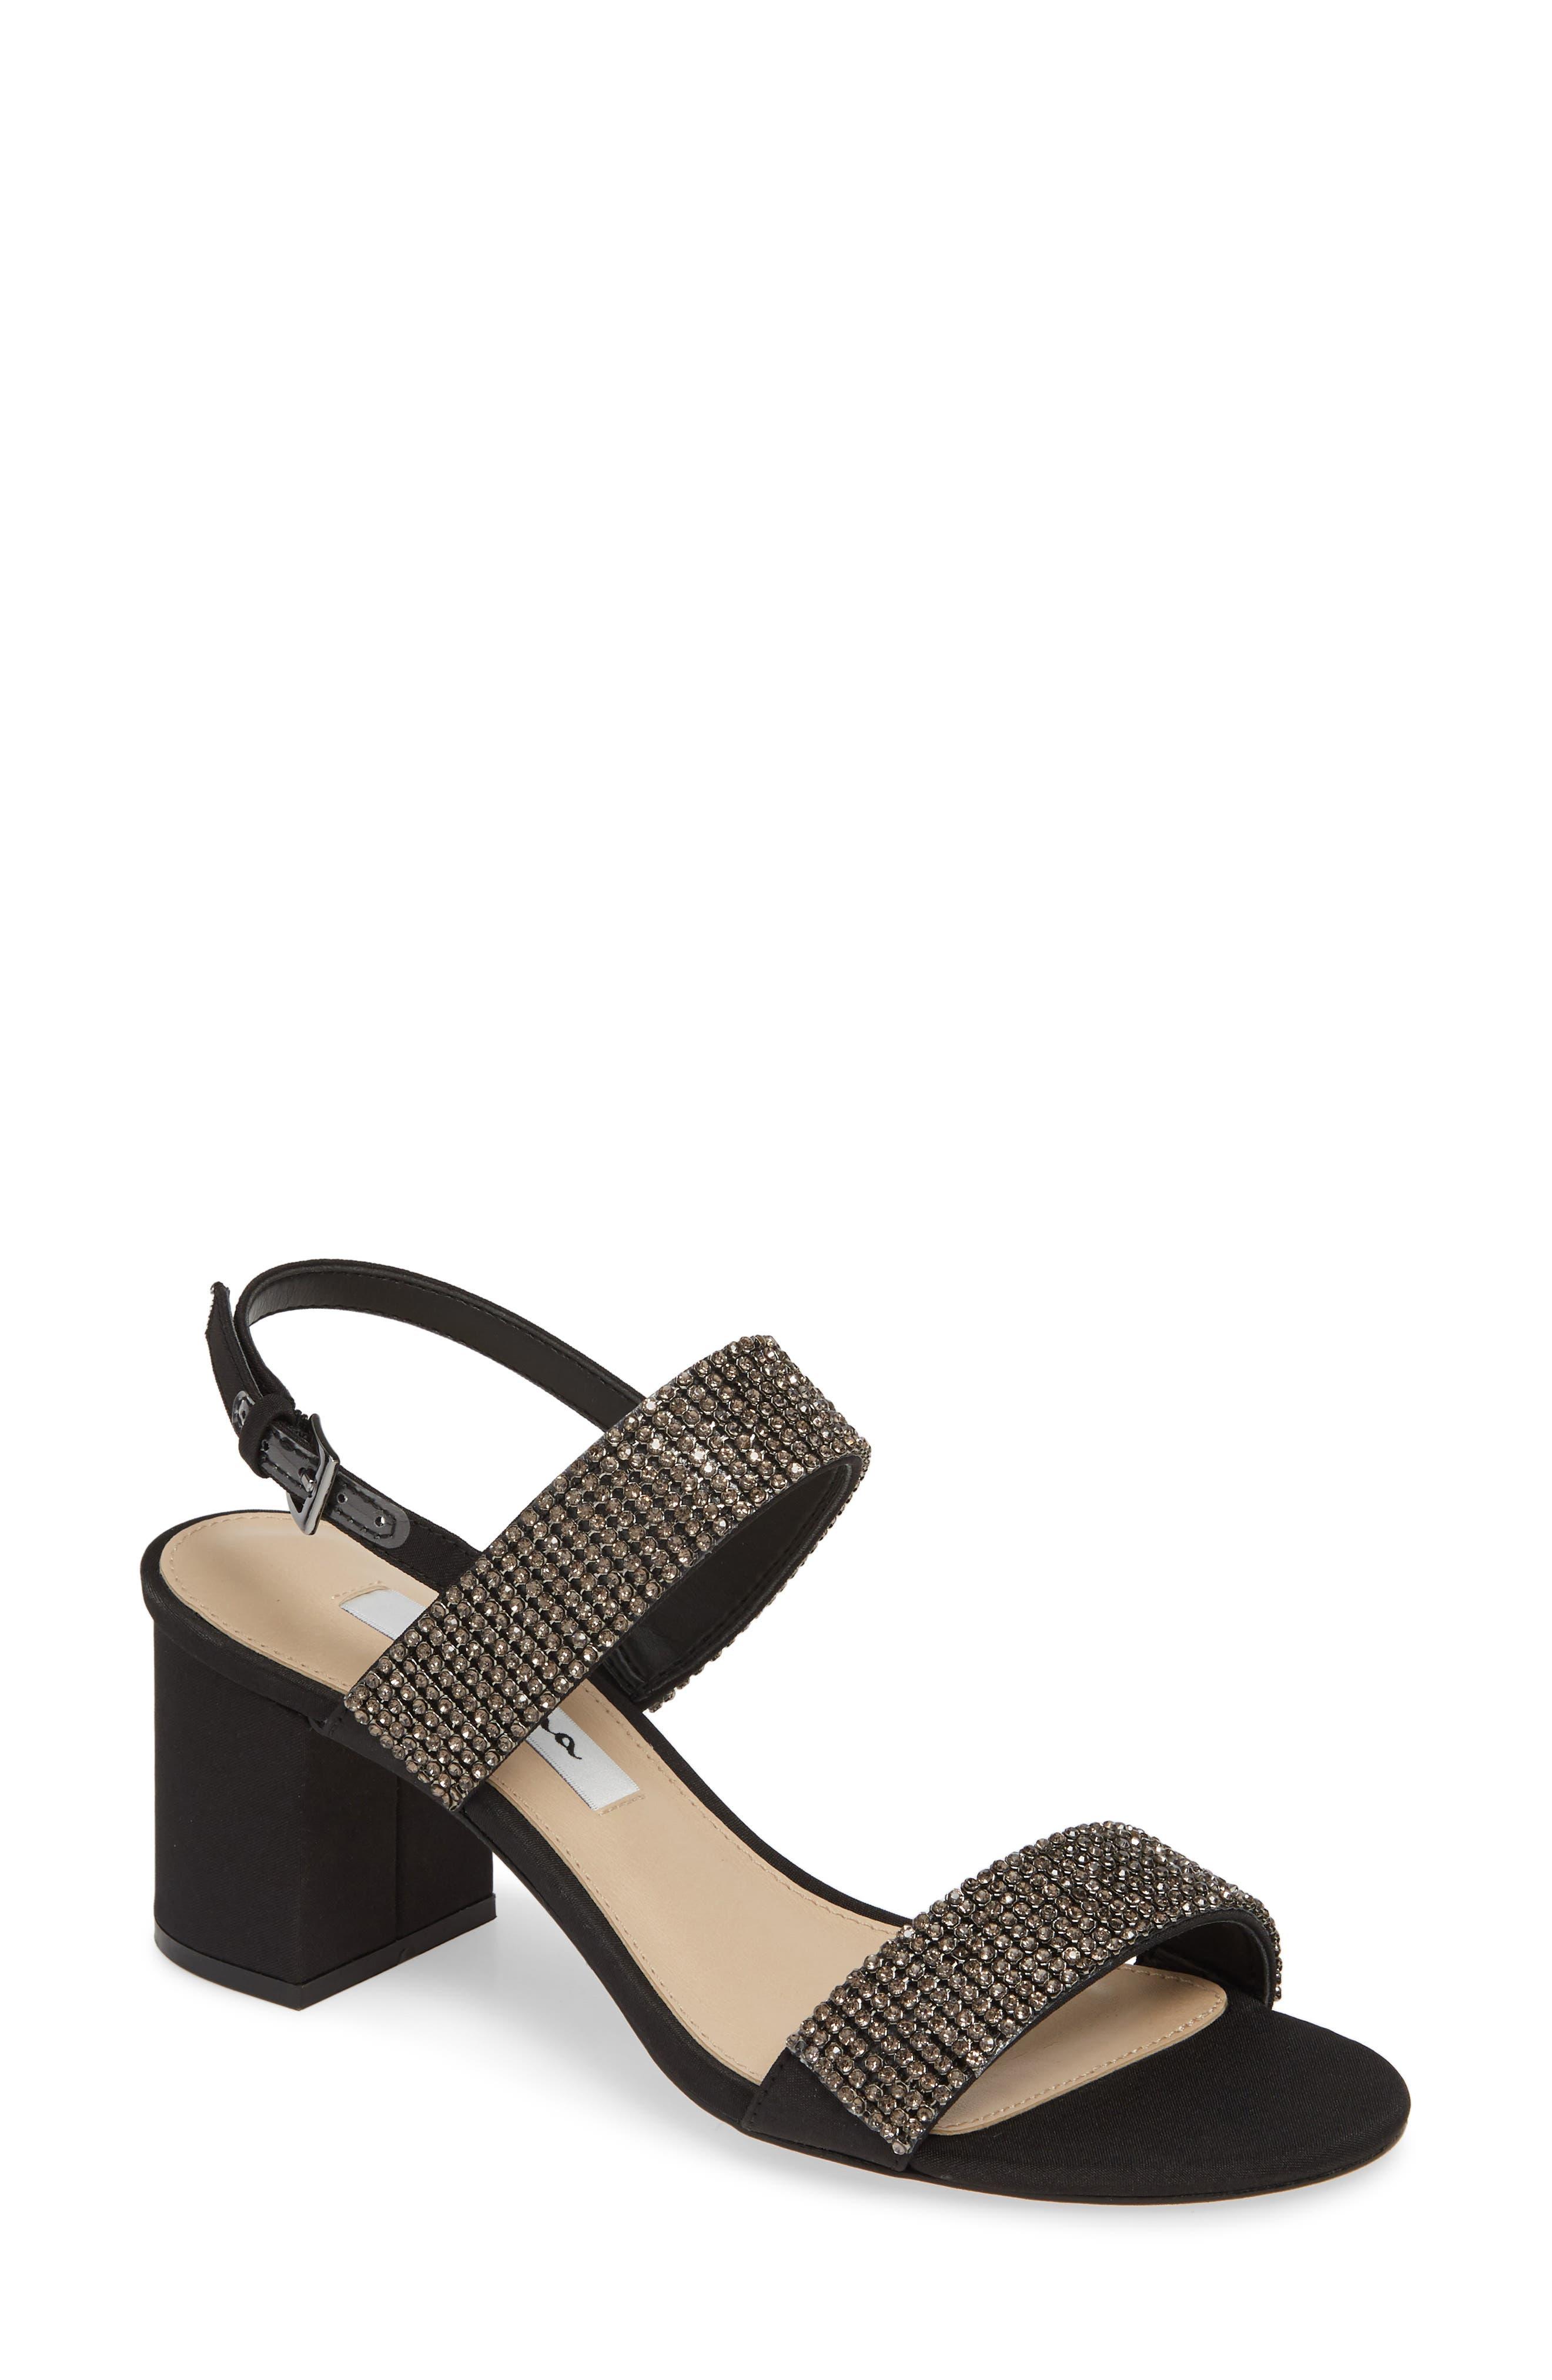 NINA Naomi Crystal Embellished Sandal, Main, color, BLACK FABRIC